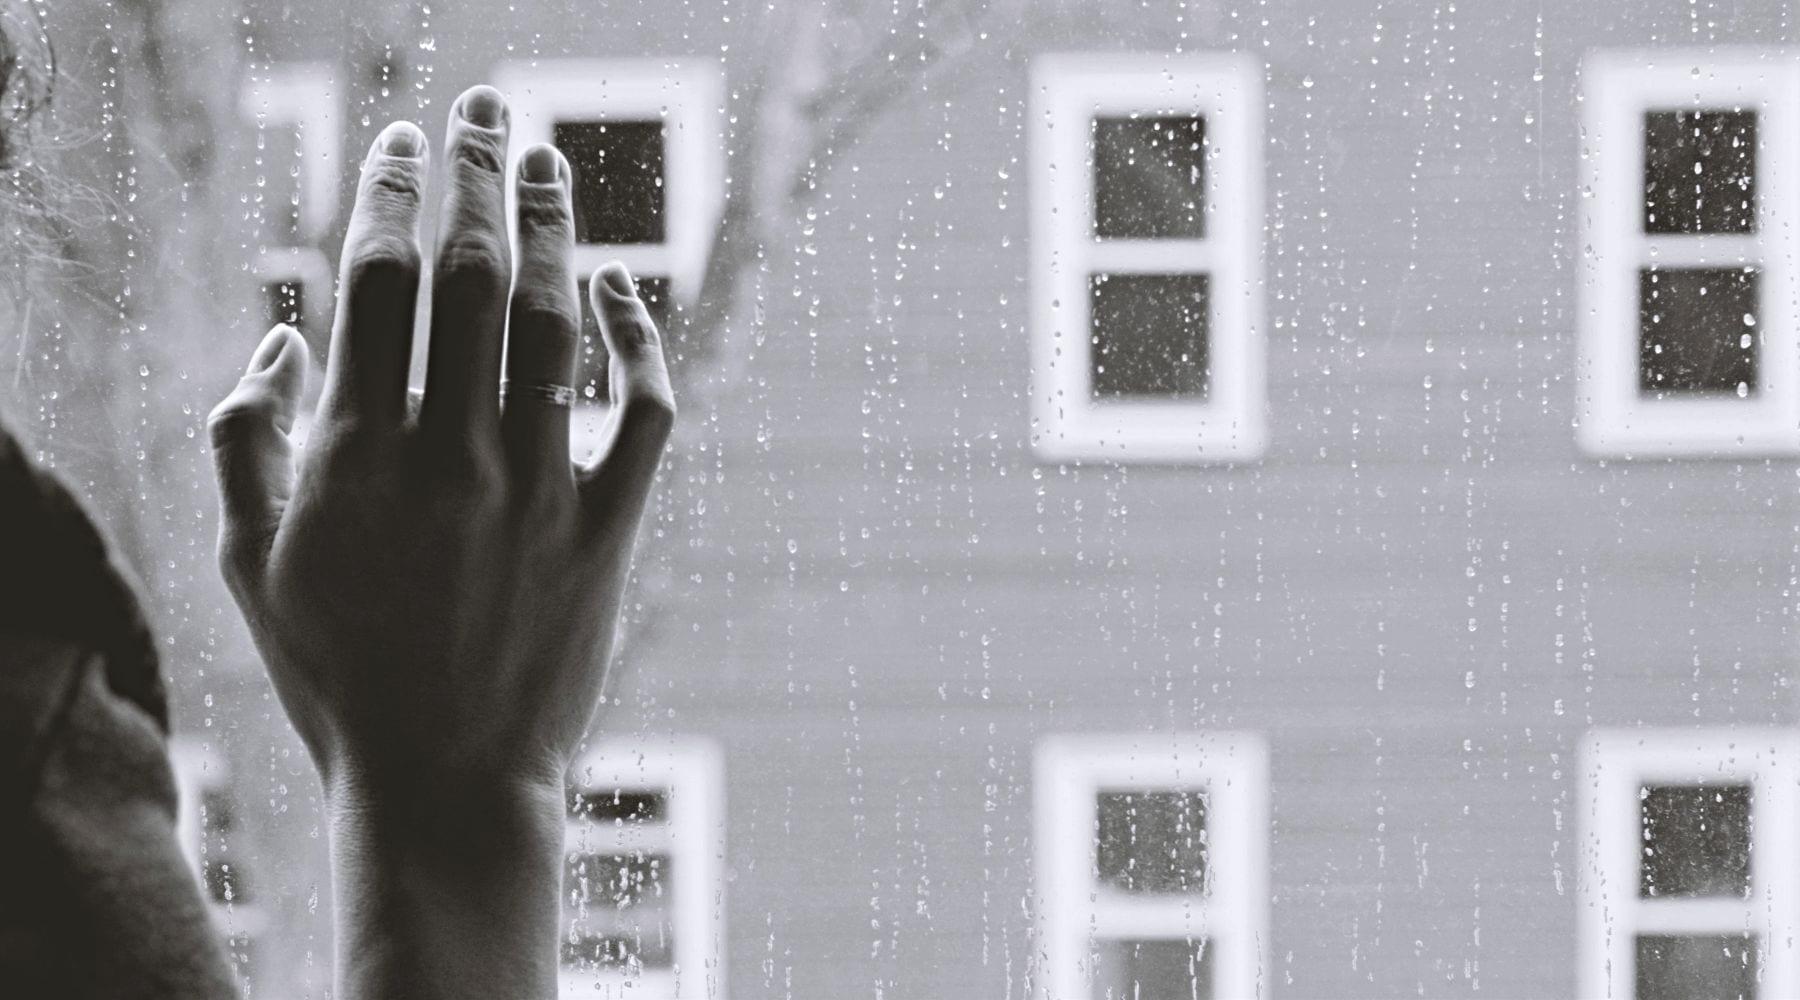 Hand on window splattered with raindrops